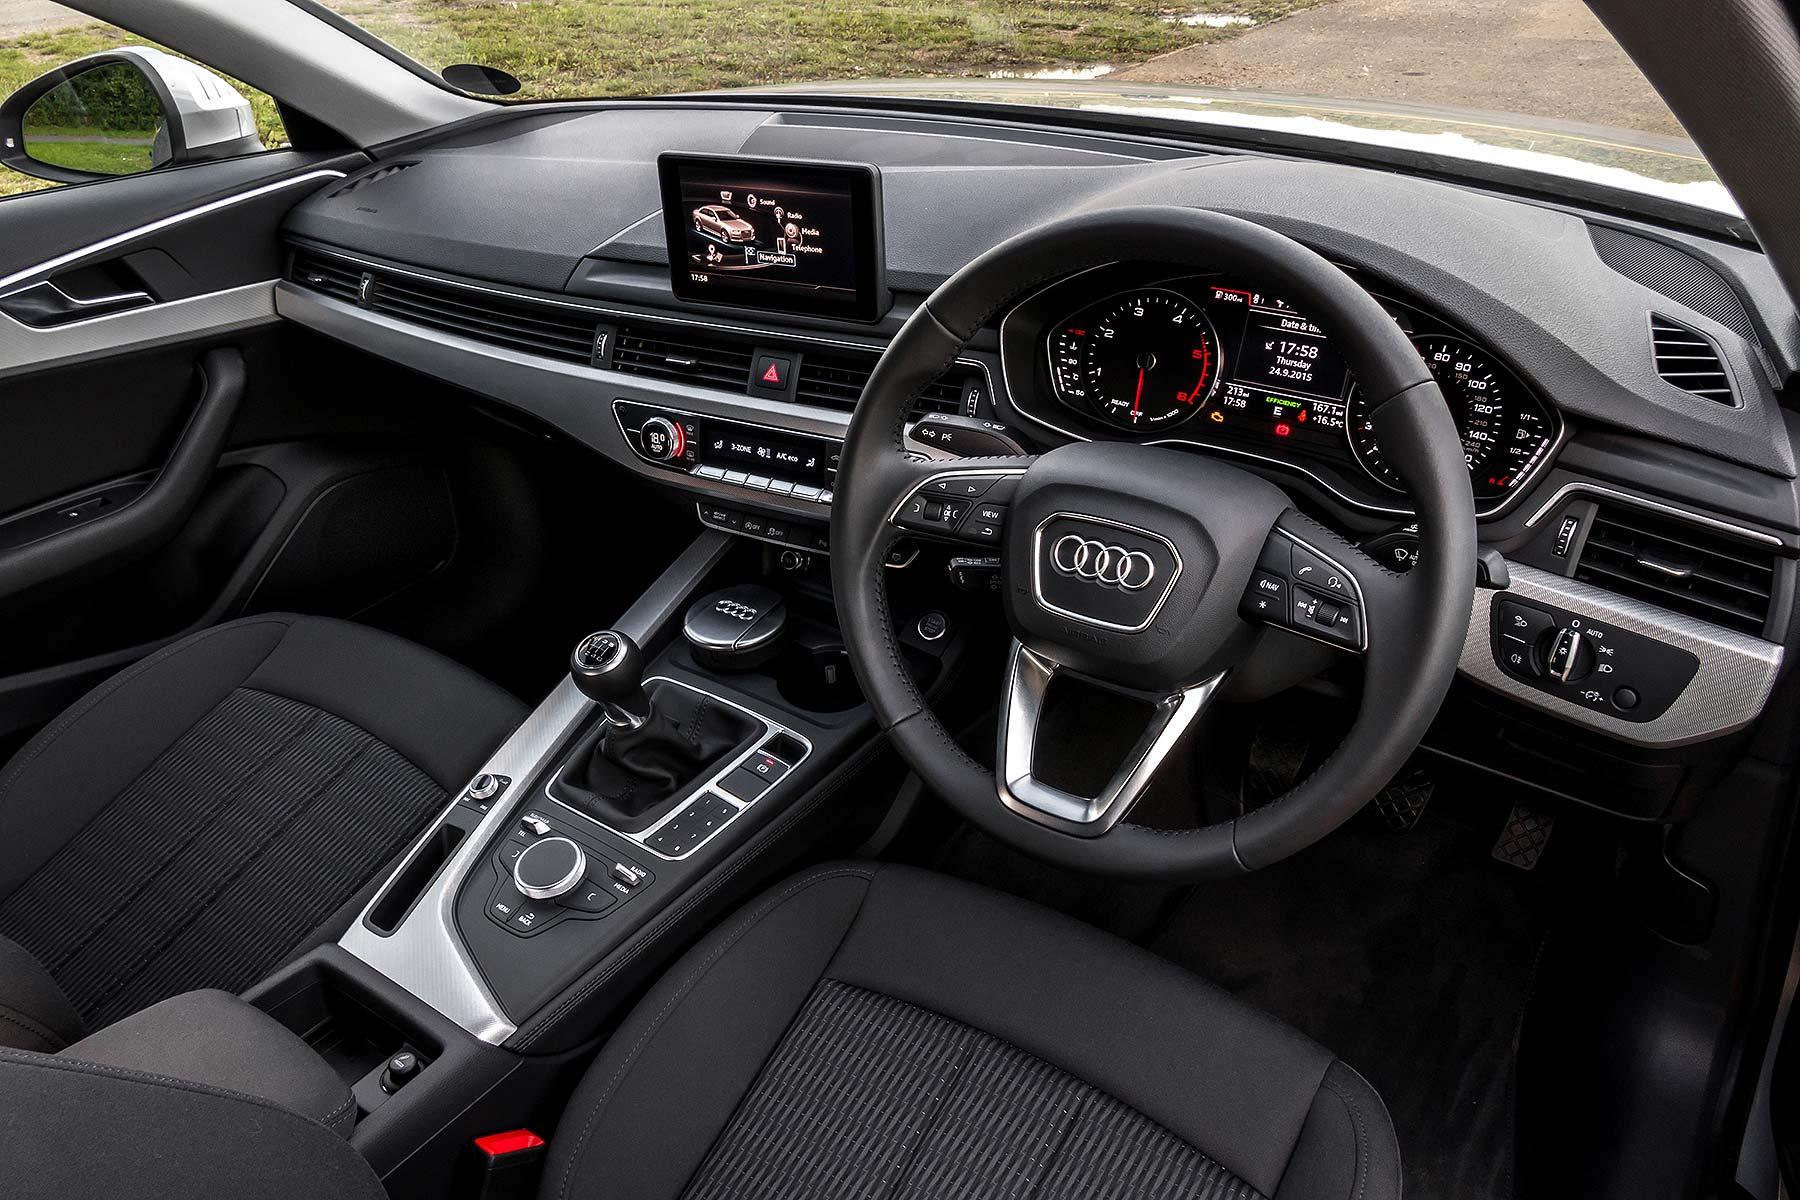 Audi A4 2 0 Tdi 150 Ultra Se Review 2015 First Drive